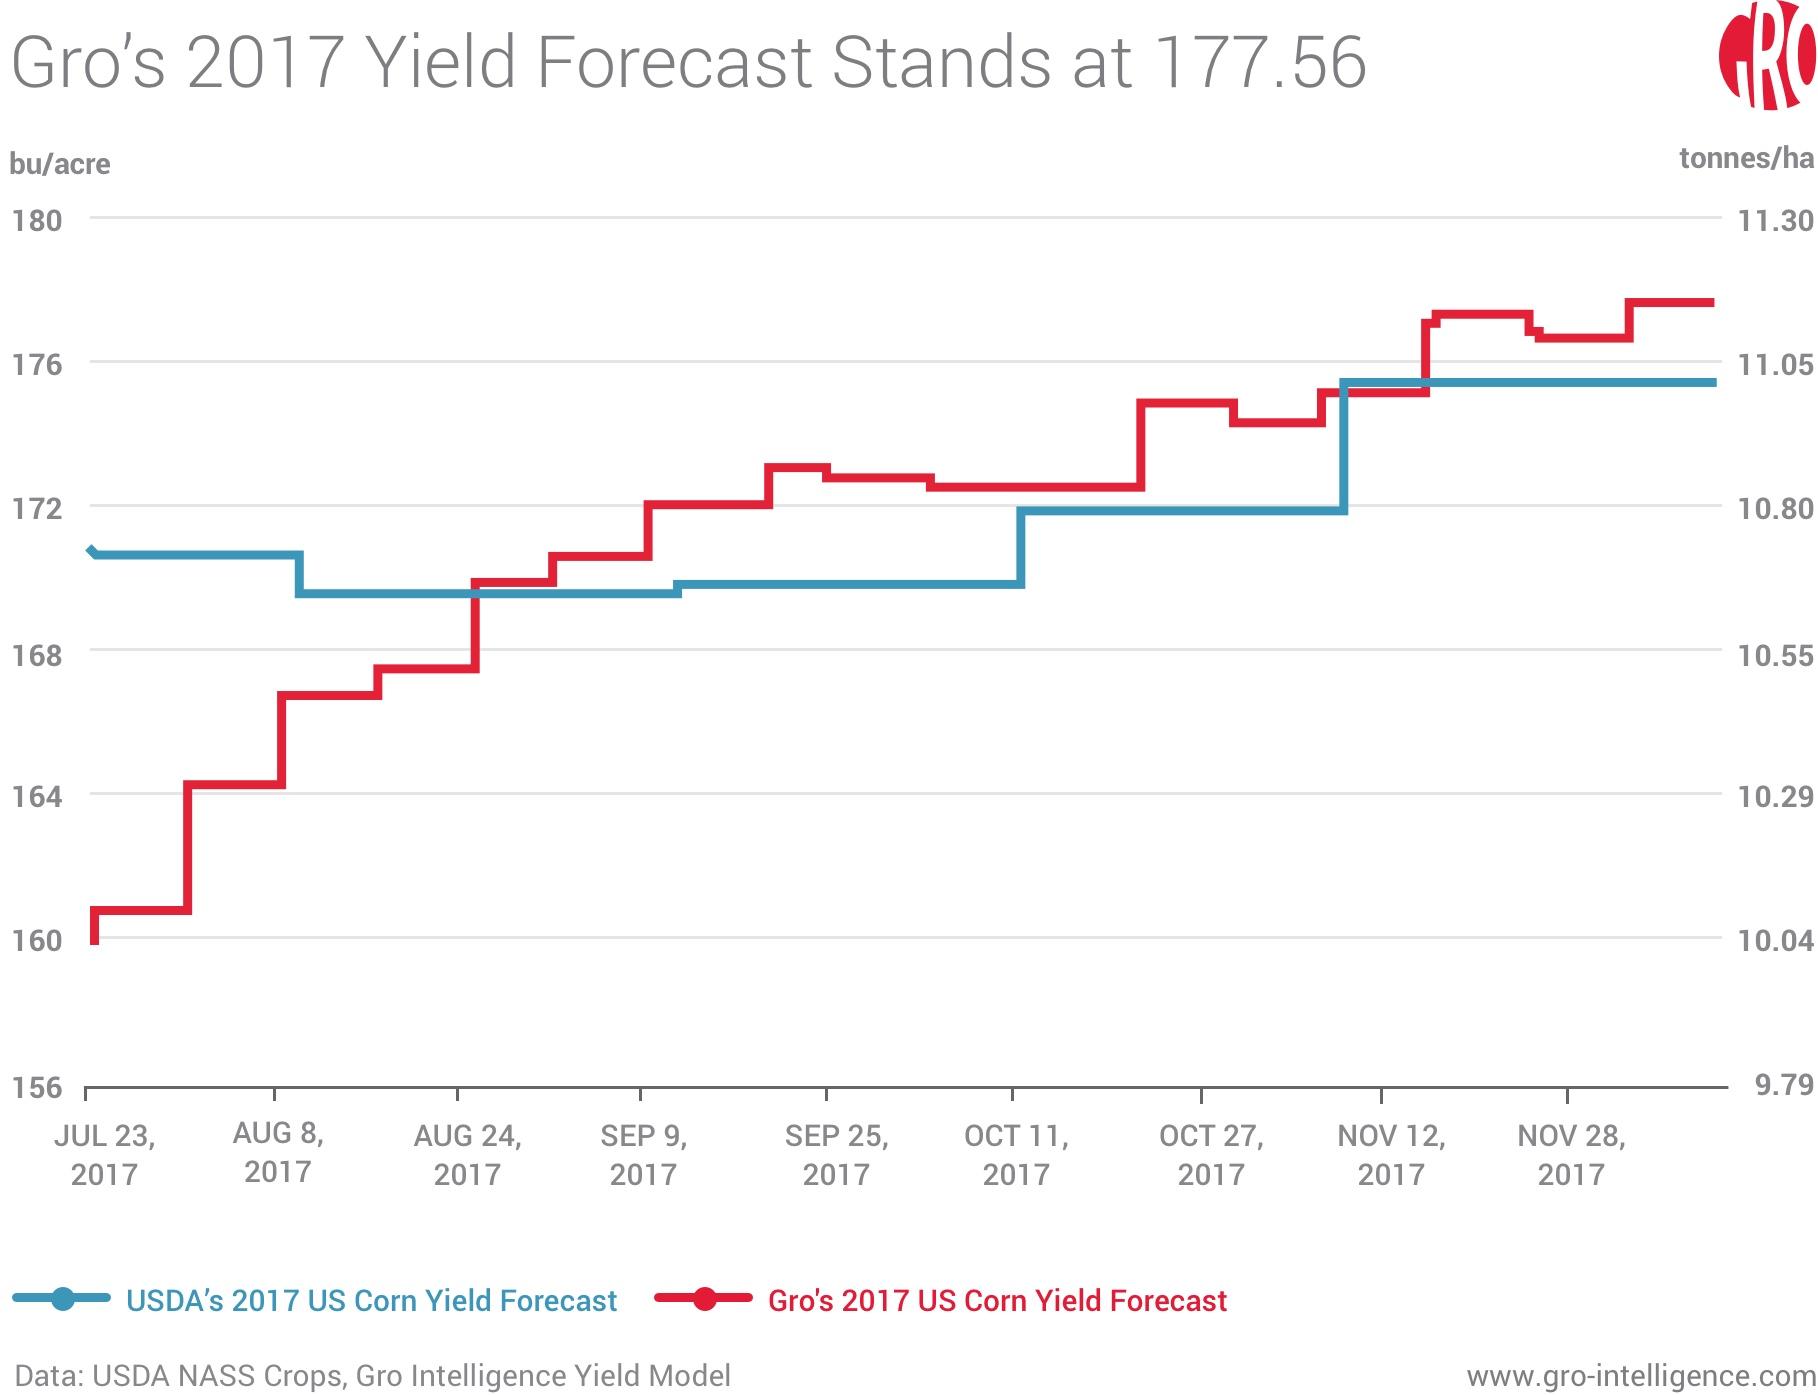 Gro's 2017 Yield Forecast